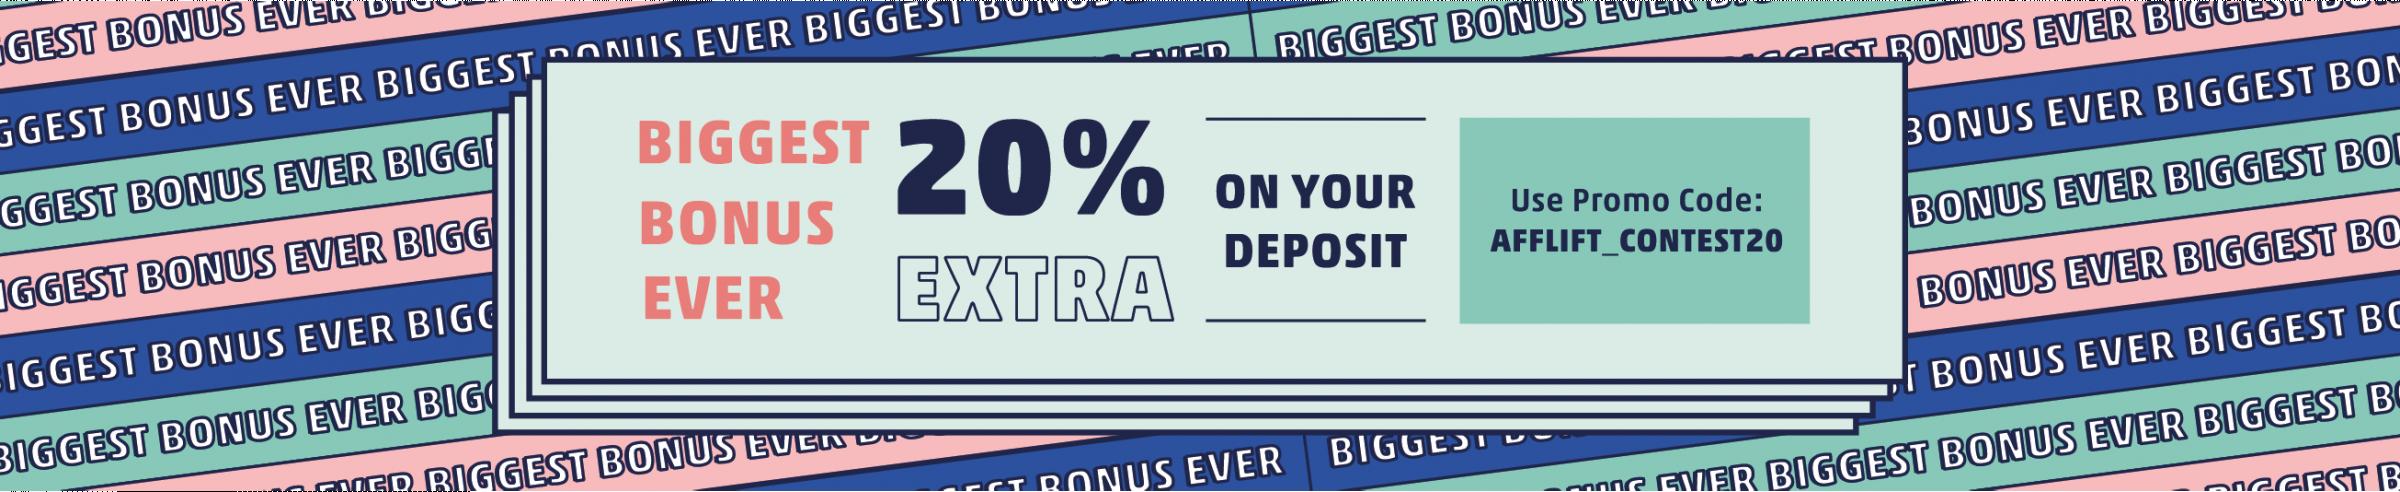 SelfAdvertiser bonus